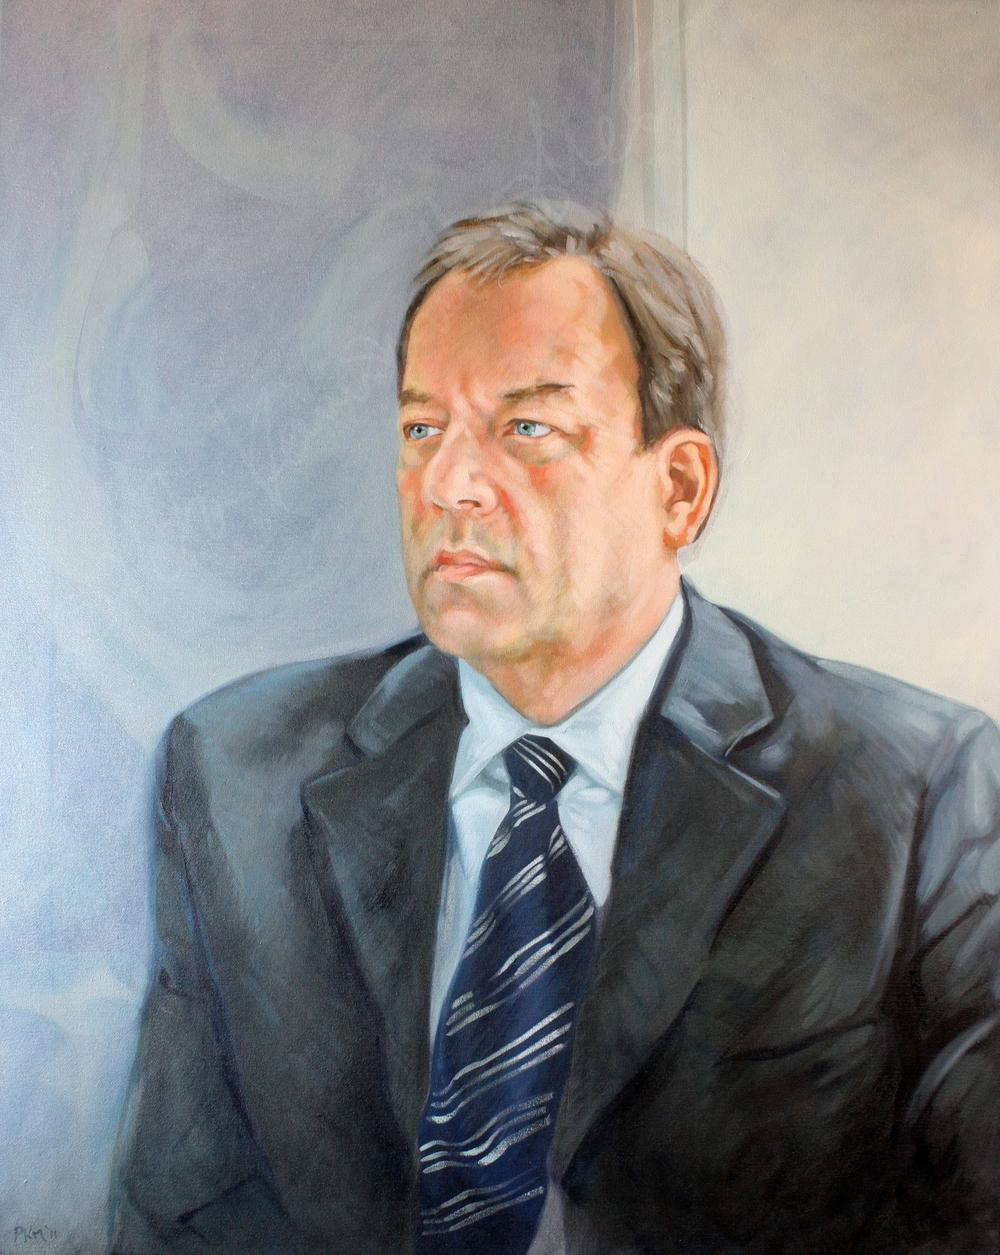 Professor Rauli Svento